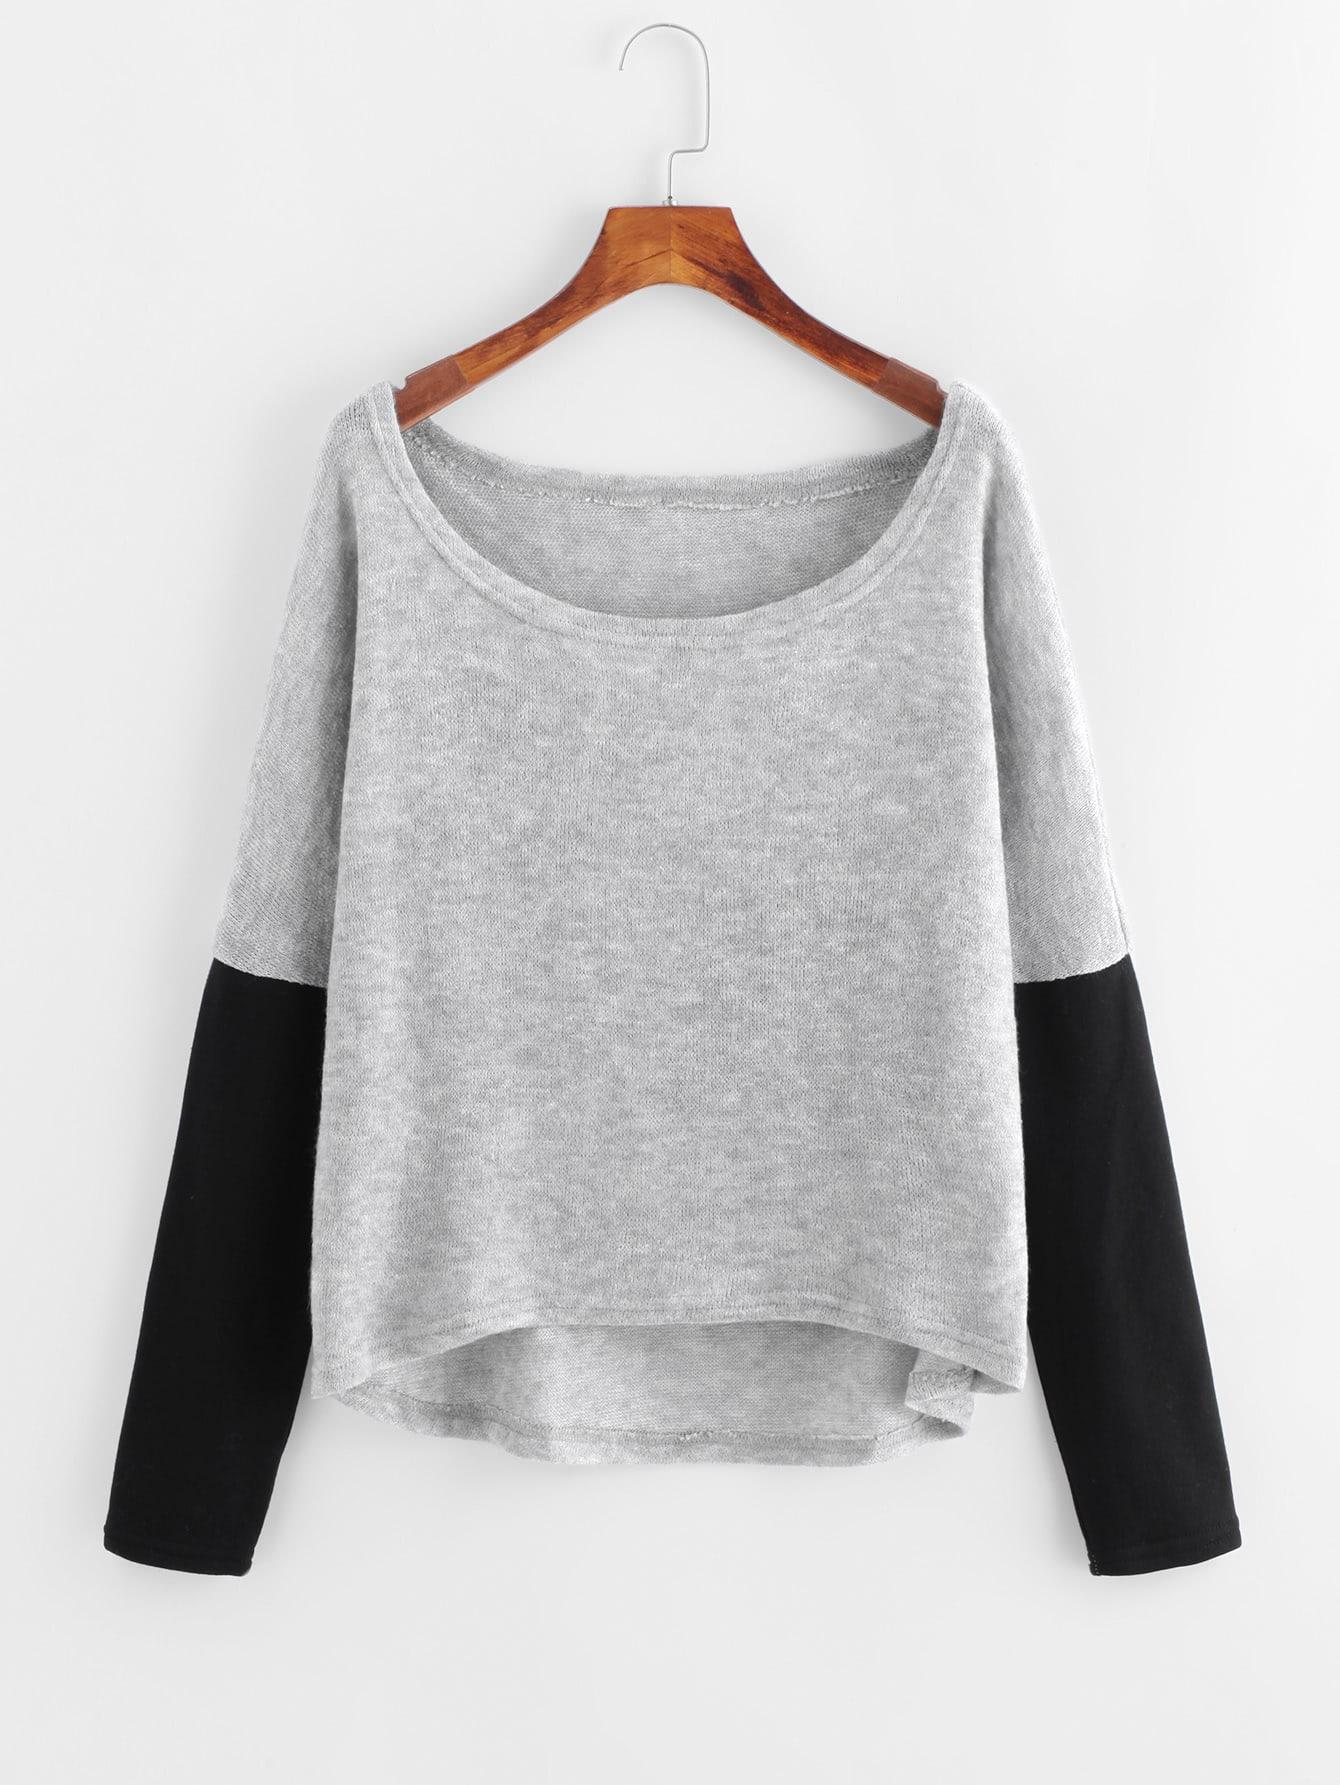 Contrast Sleeve Dip Hem Sweater sweater171023175